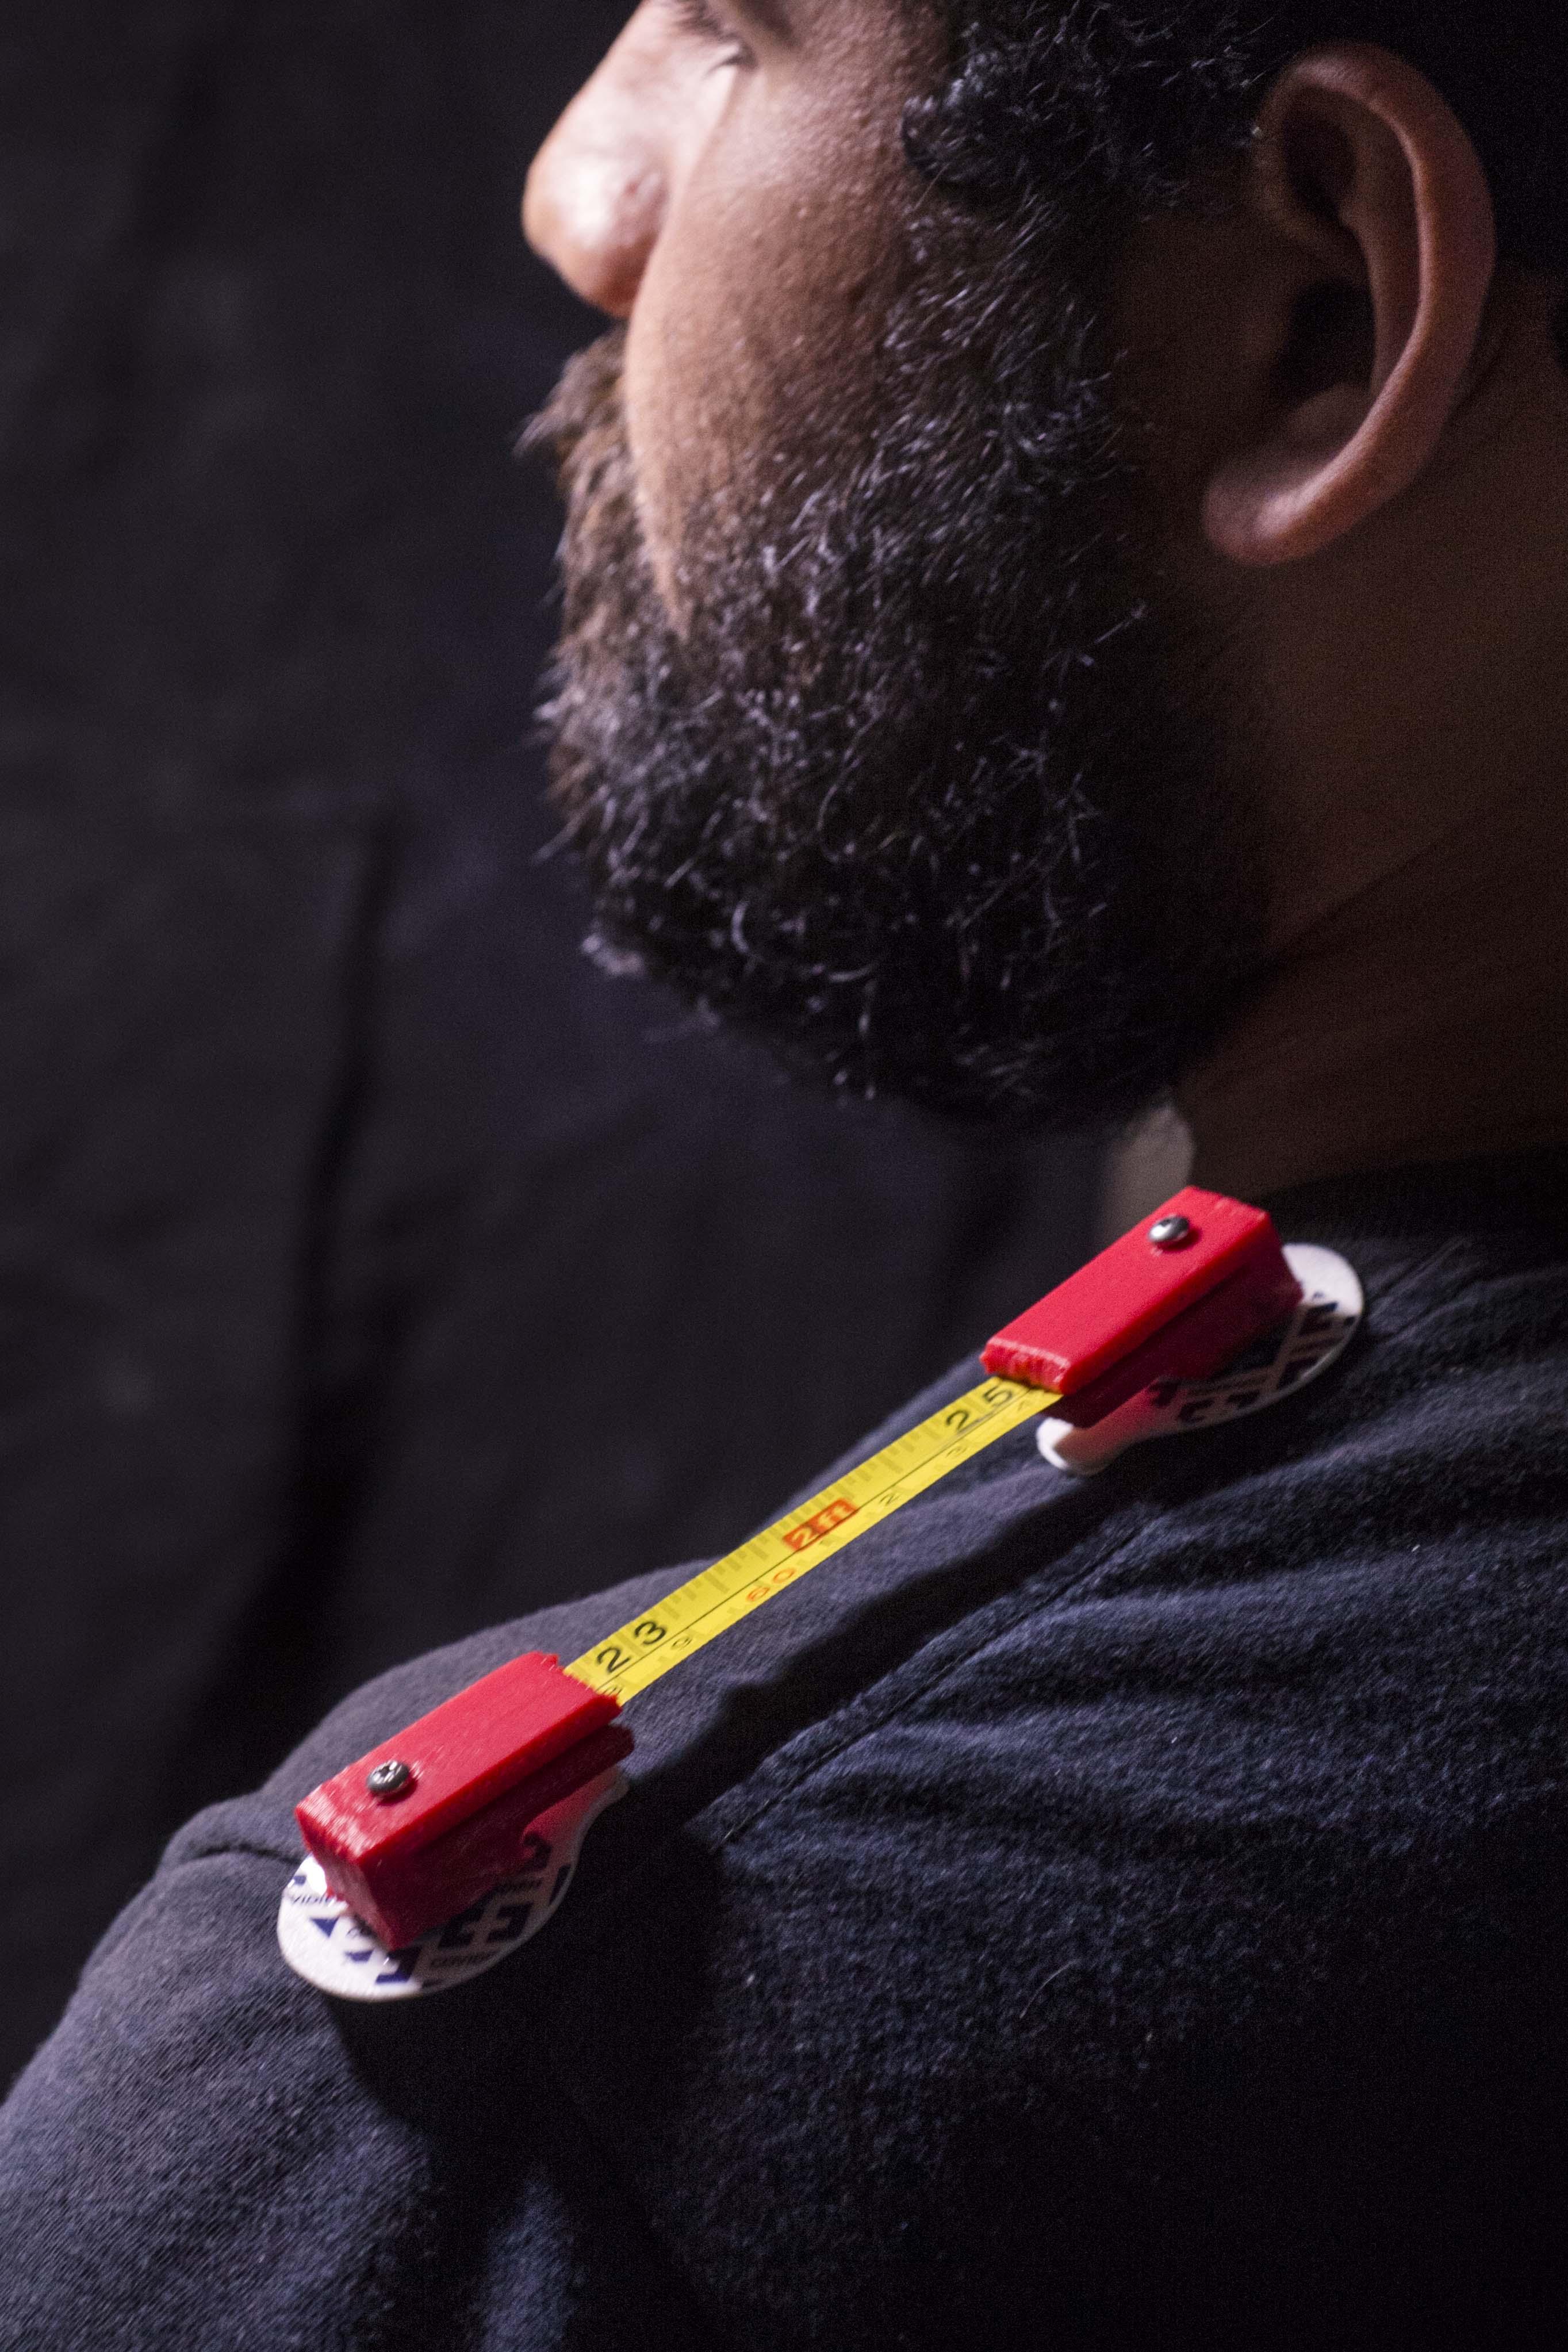 Jose Juan Mendez Jr., mechanical engineering senior, shows his invention that helps patients during shoulder rehabilitation